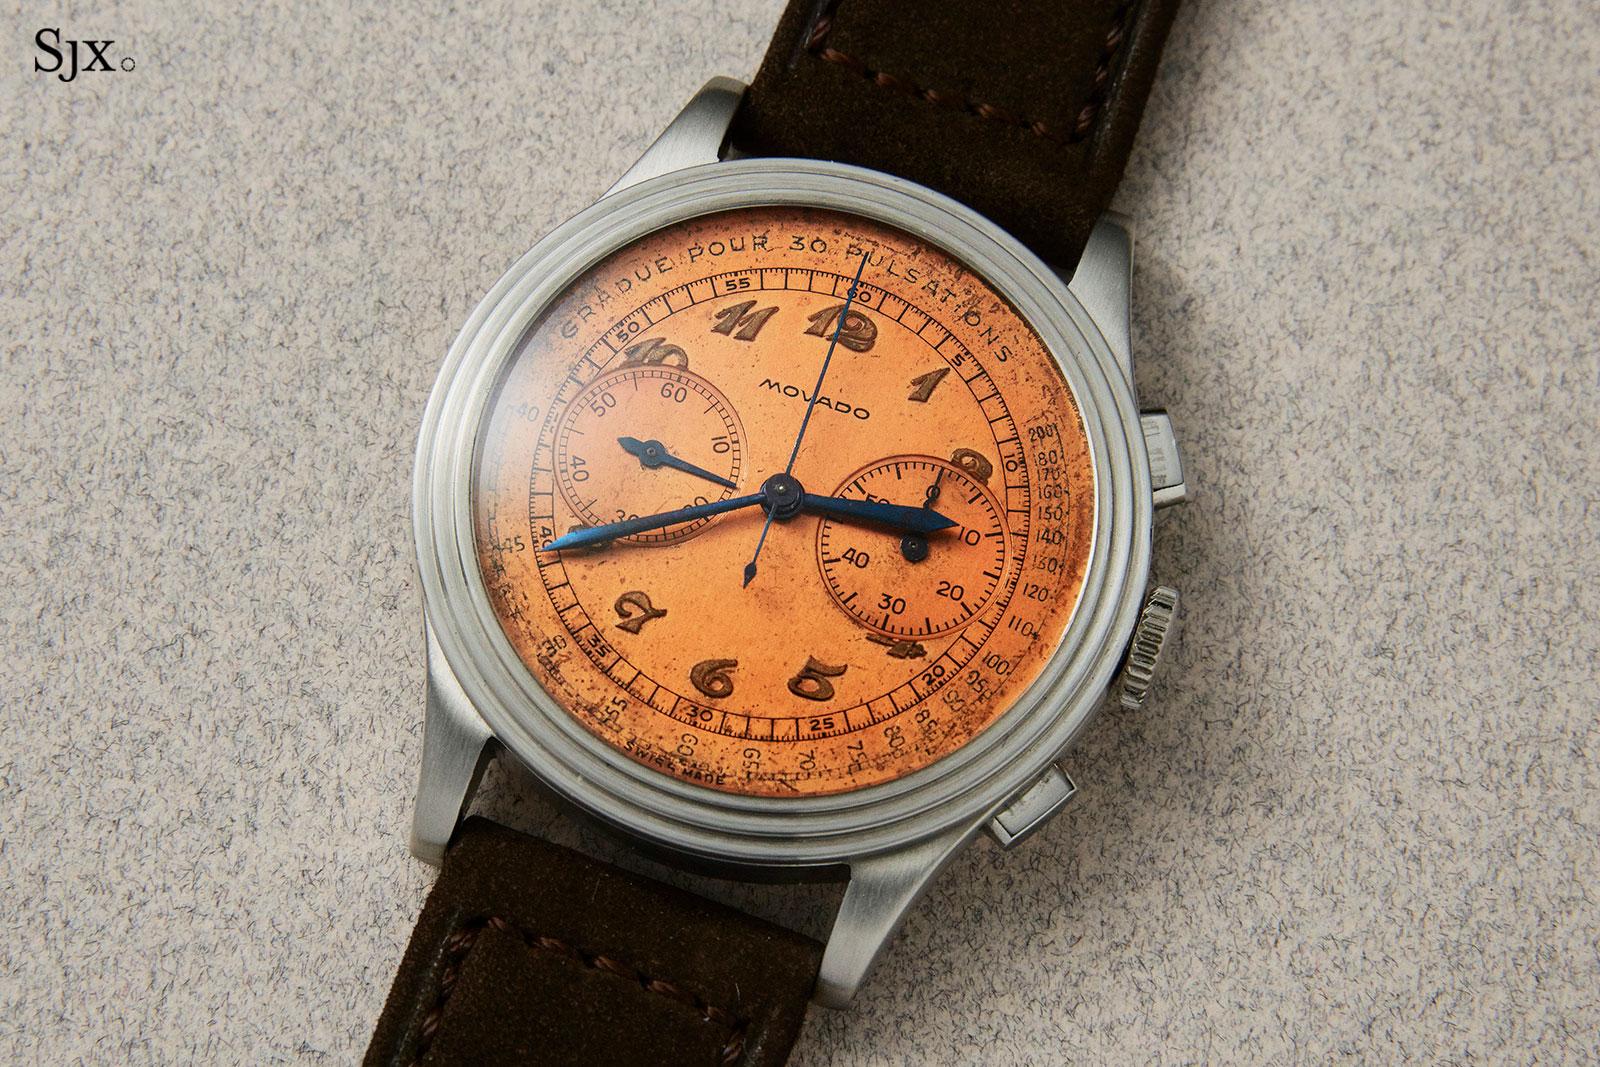 Movado chronograph ref. 19005-2